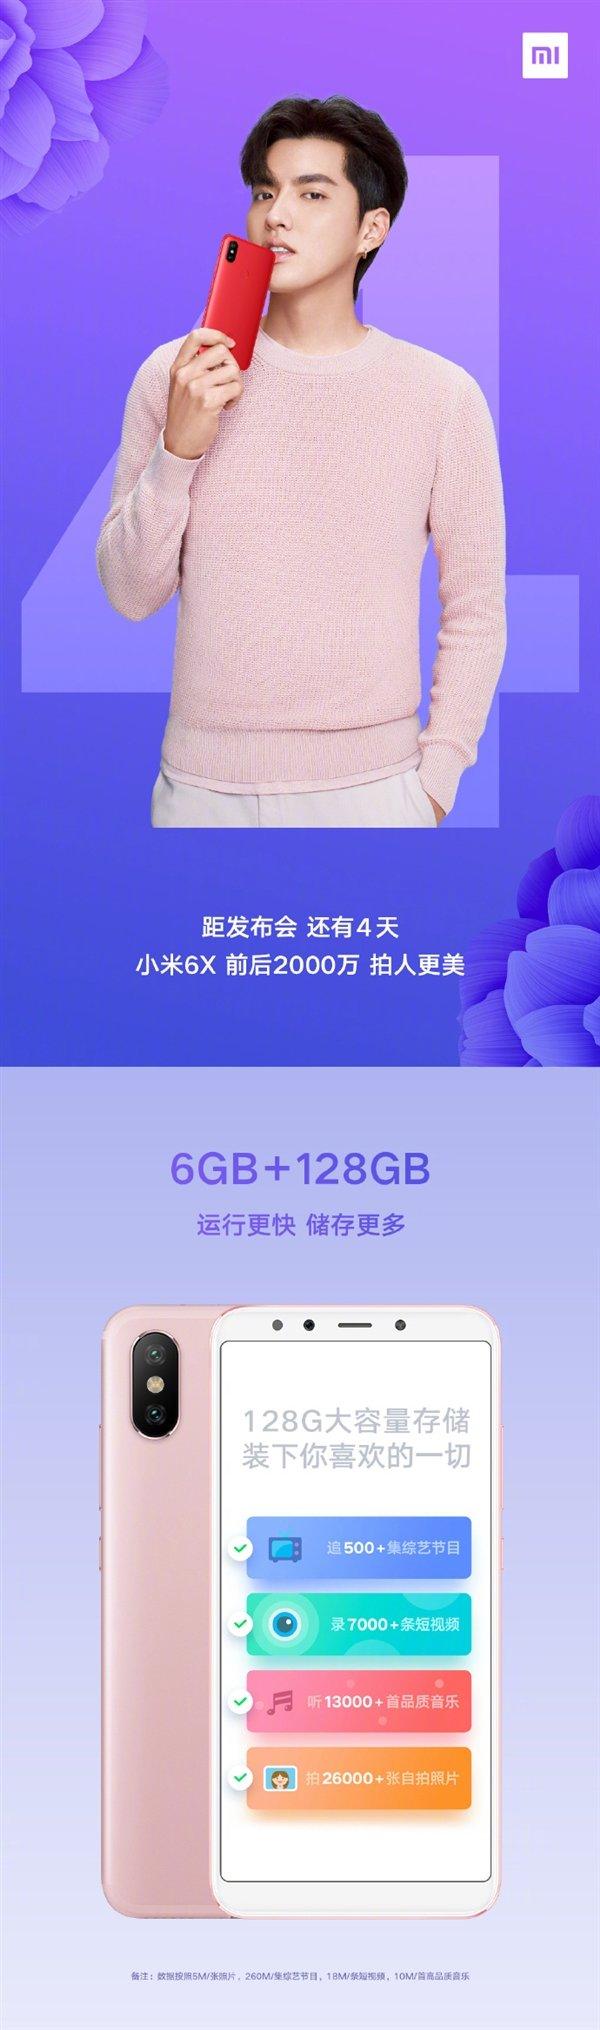 To τελευταίο teaser της Xiaomi επιβεβαιώνει την ύπαρξη έκδοσης του Mi 6X με 6GB RAM+128GB ROM 1